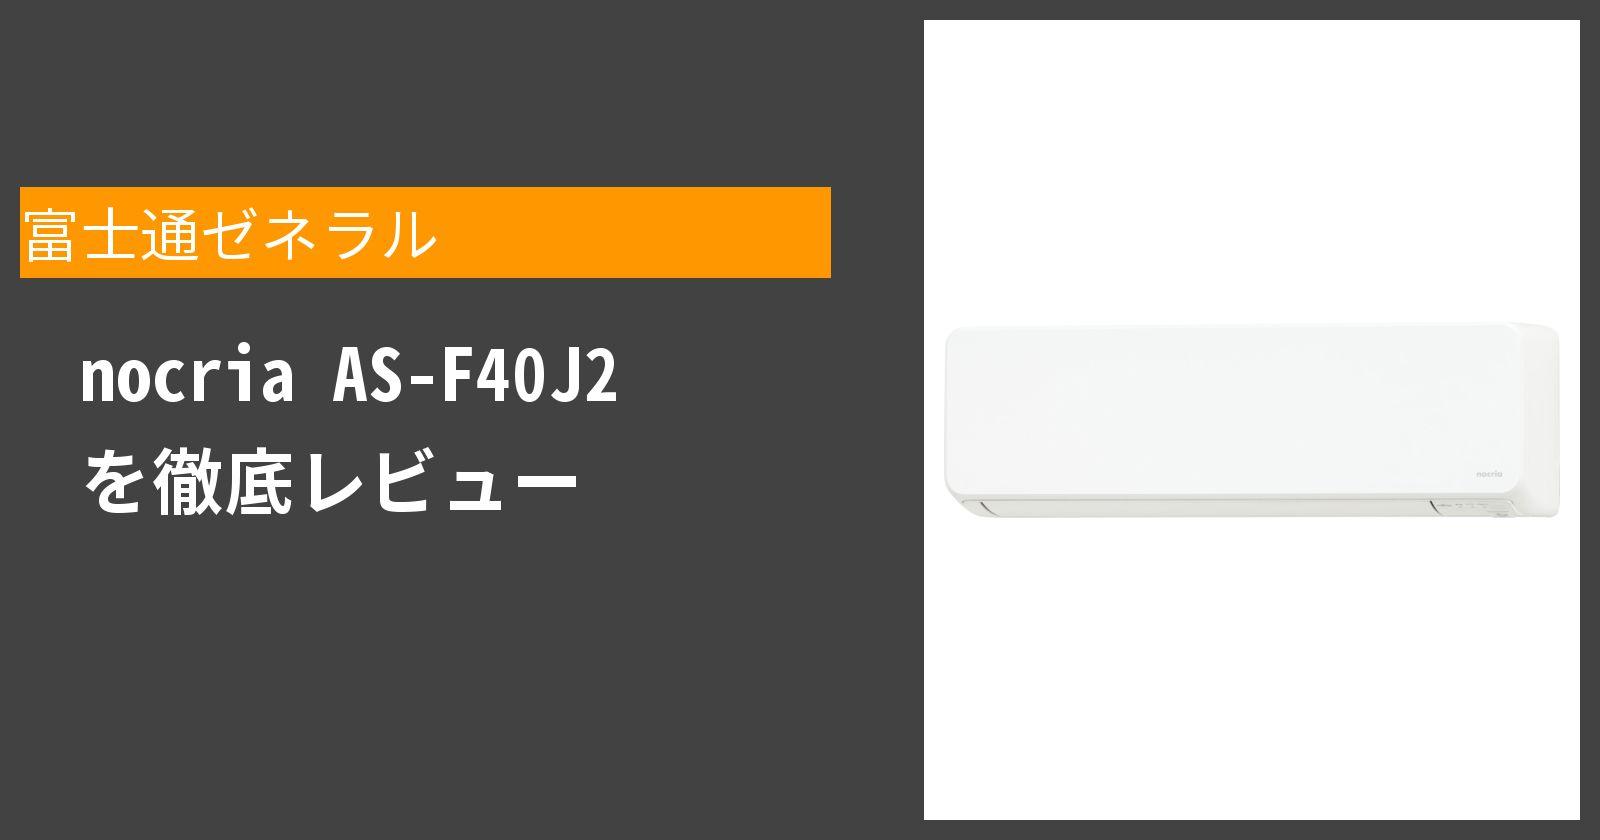 nocria AS-F40J2を徹底評価